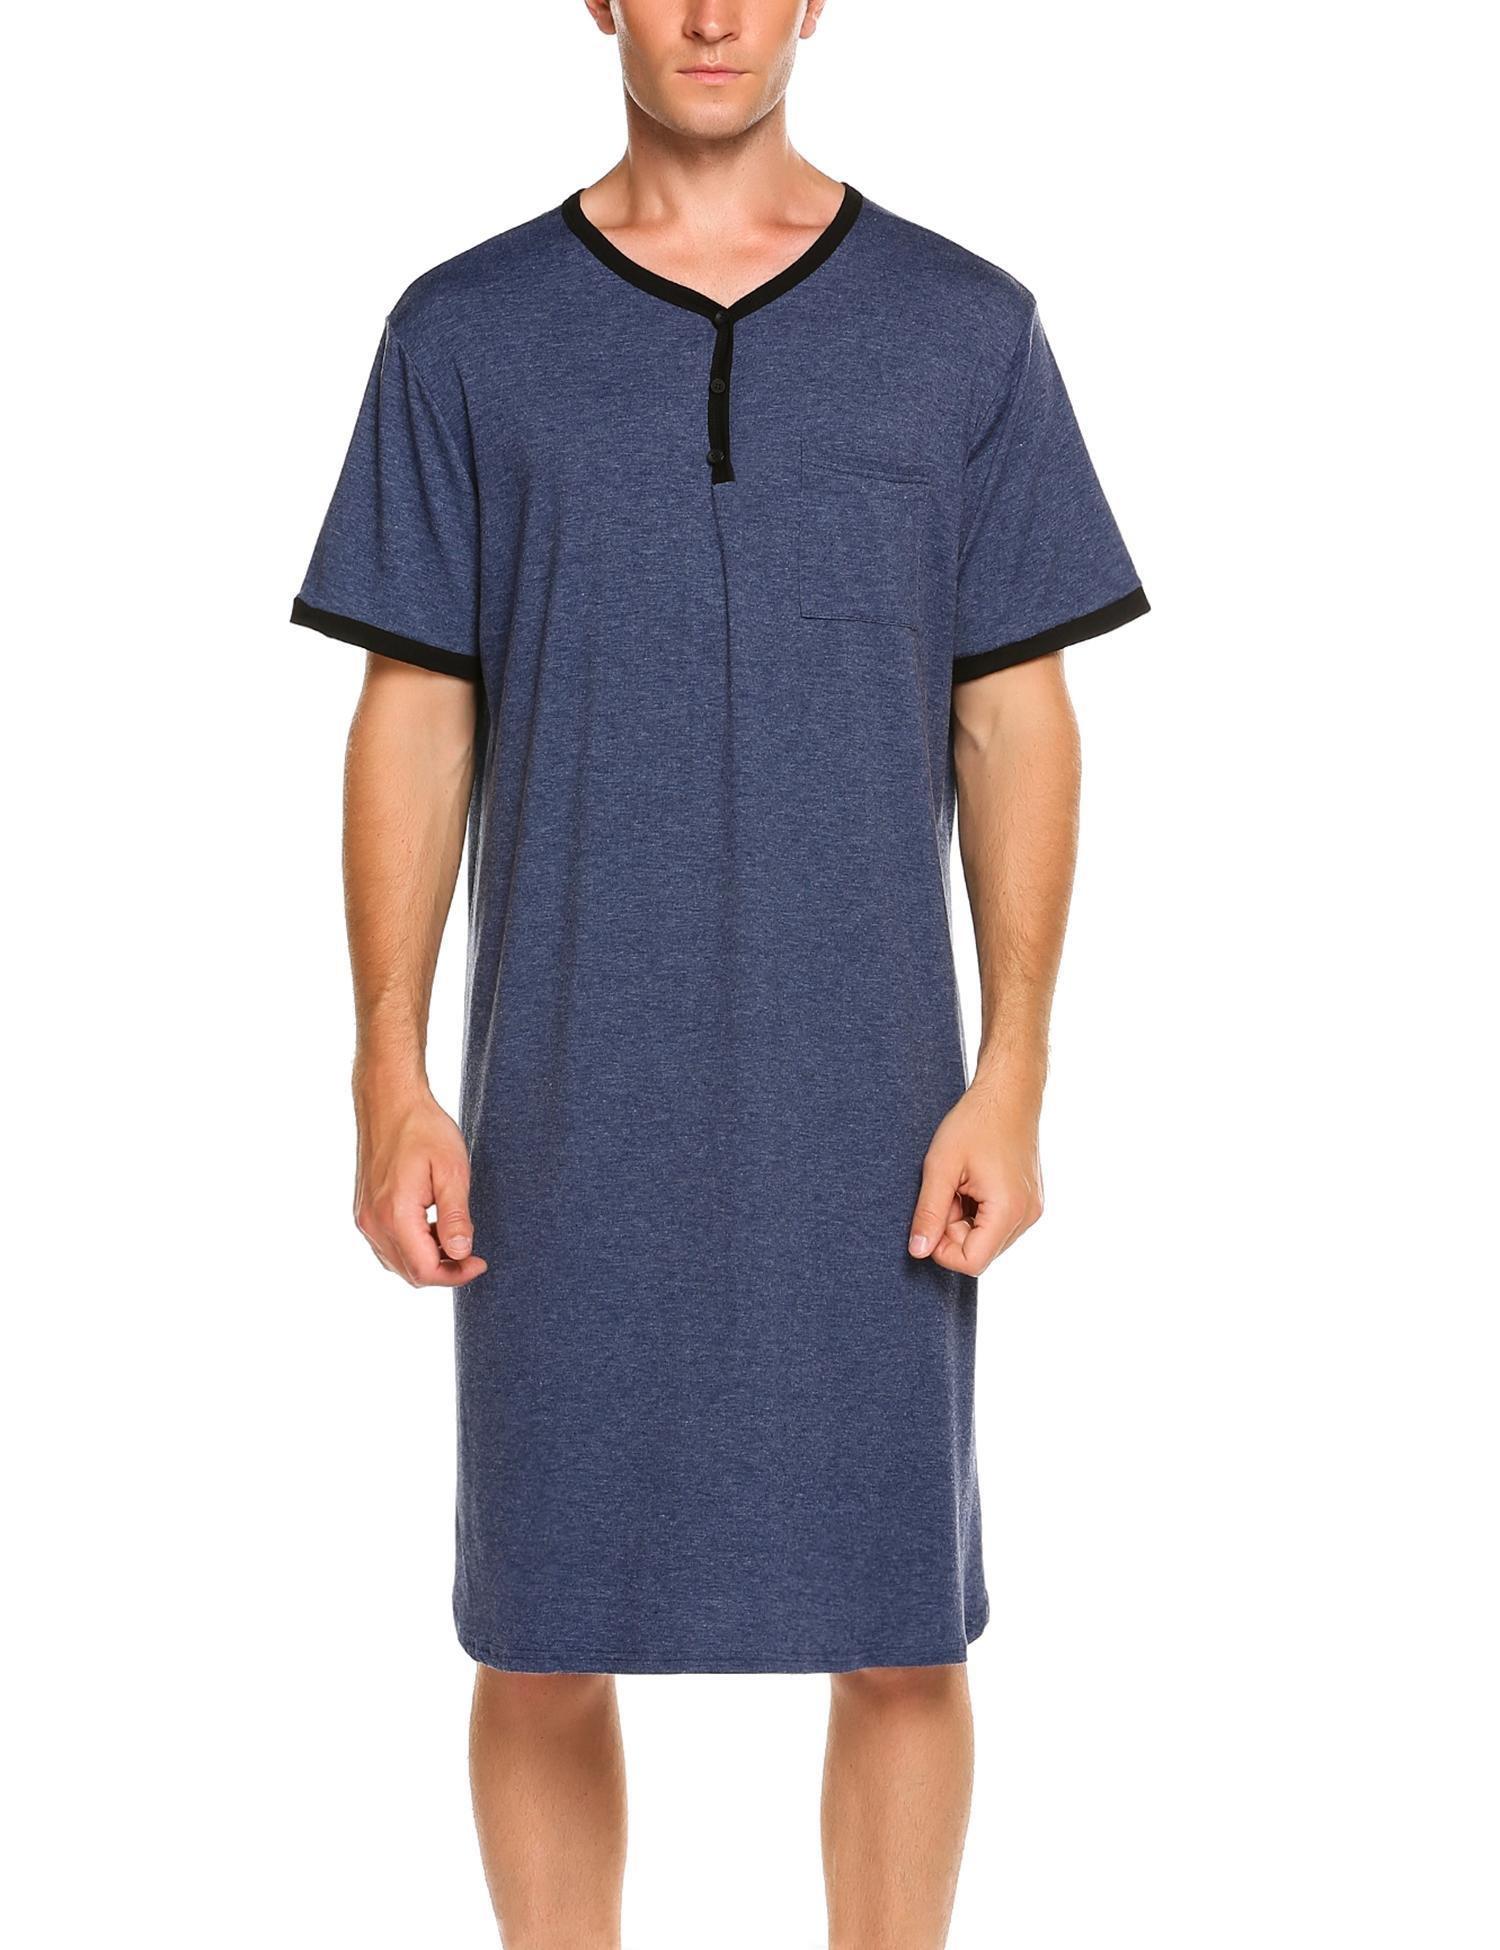 Adoeve Nightdress Men's Comfort Sleepwear Short Sleeve Nightshirt Sleep Shirt (Blue, XXXL)